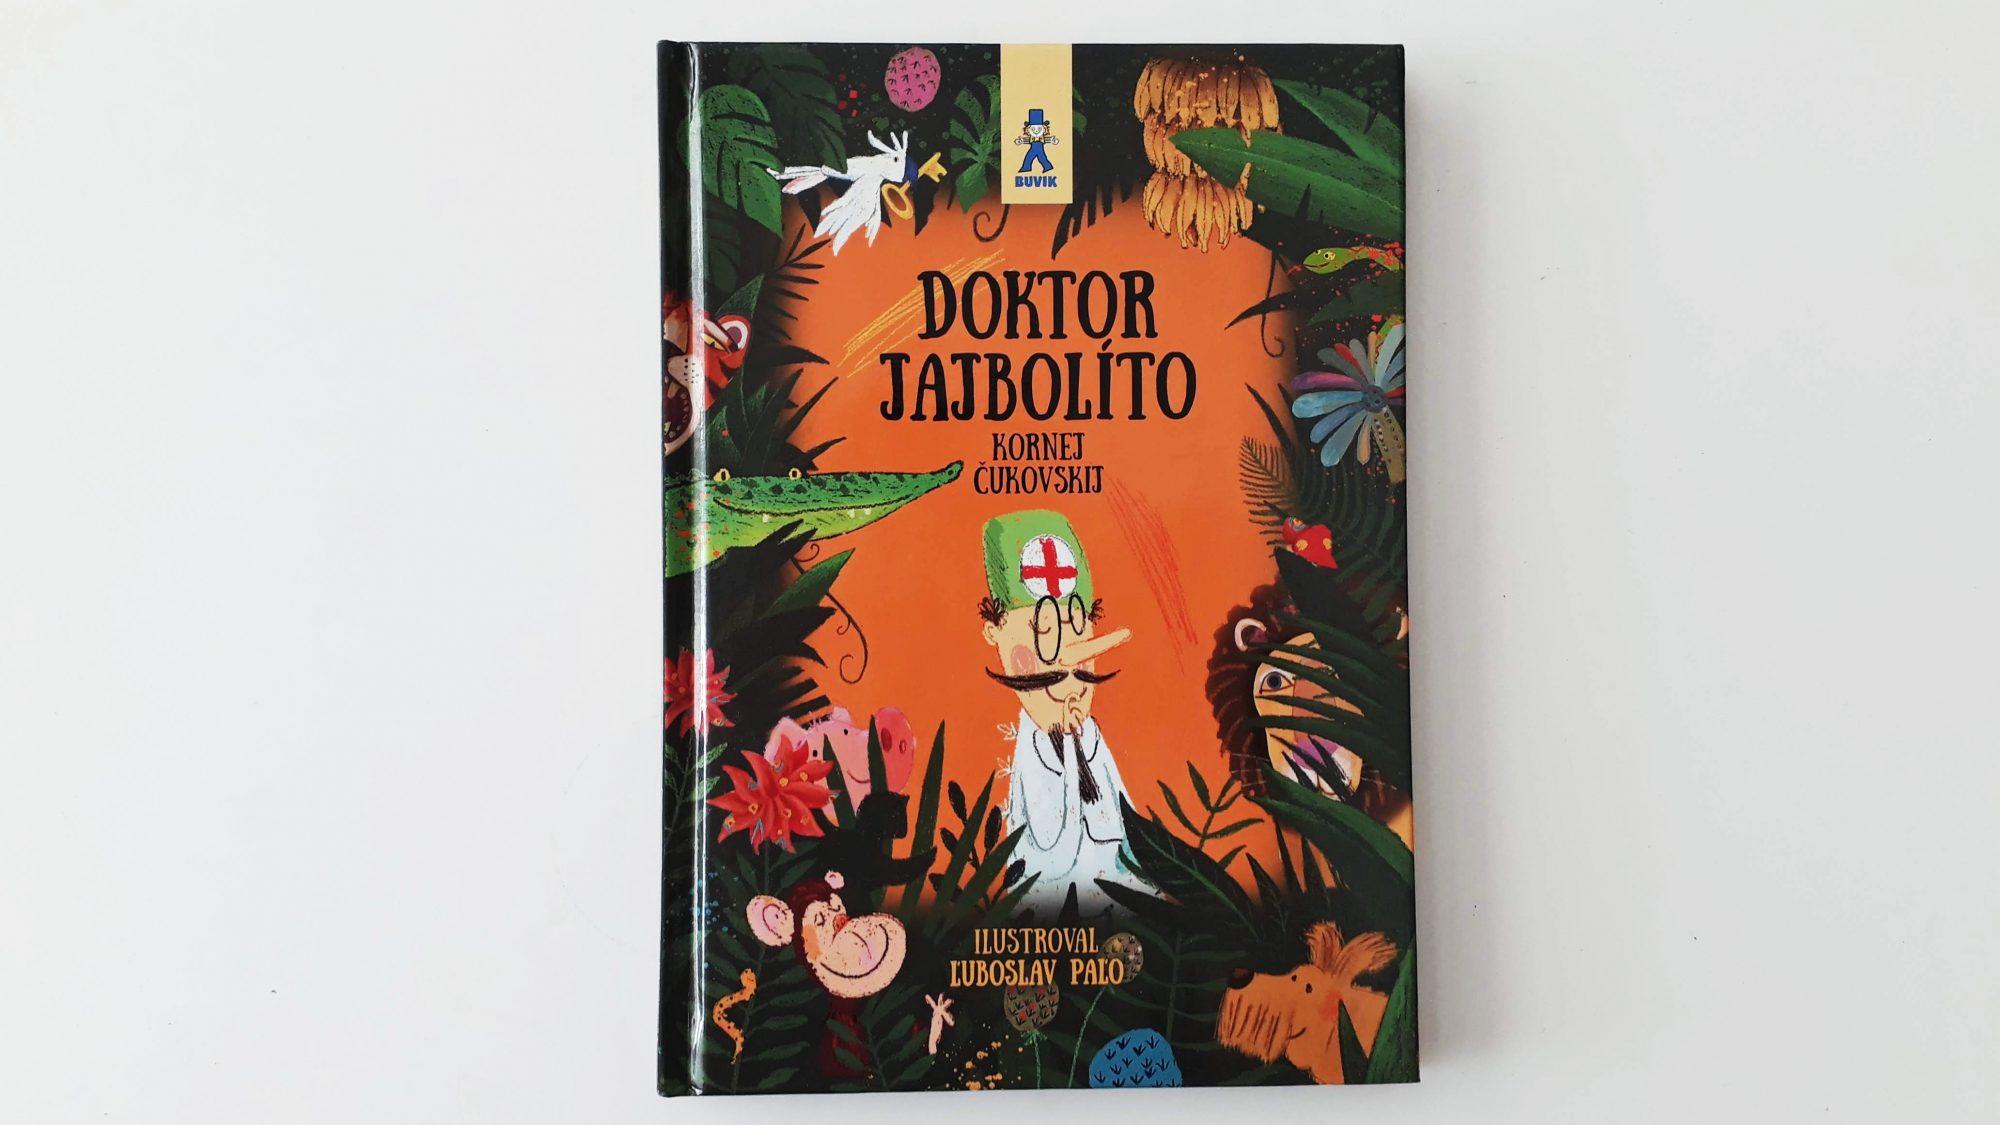 knihy doktor jajbolito